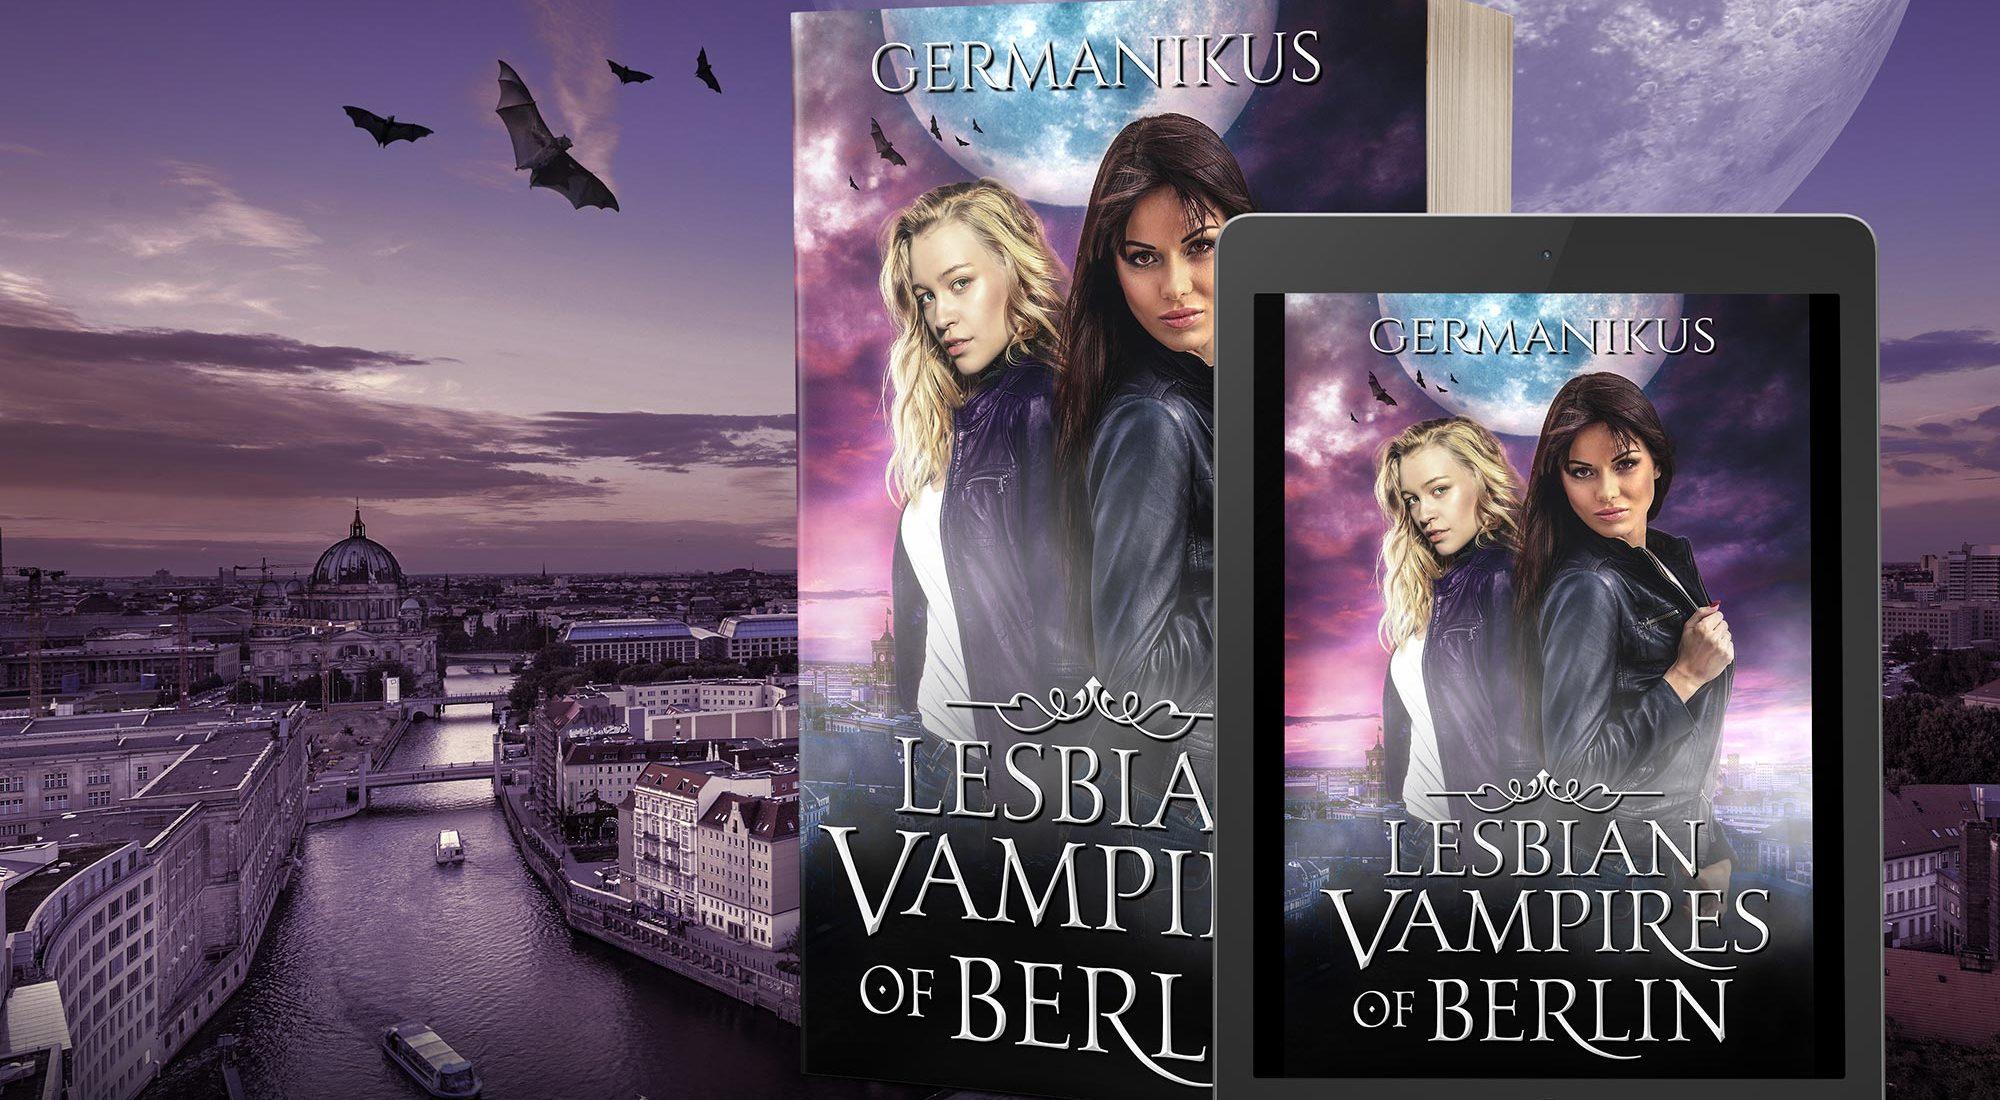 Lesbian Vampires of Berlin